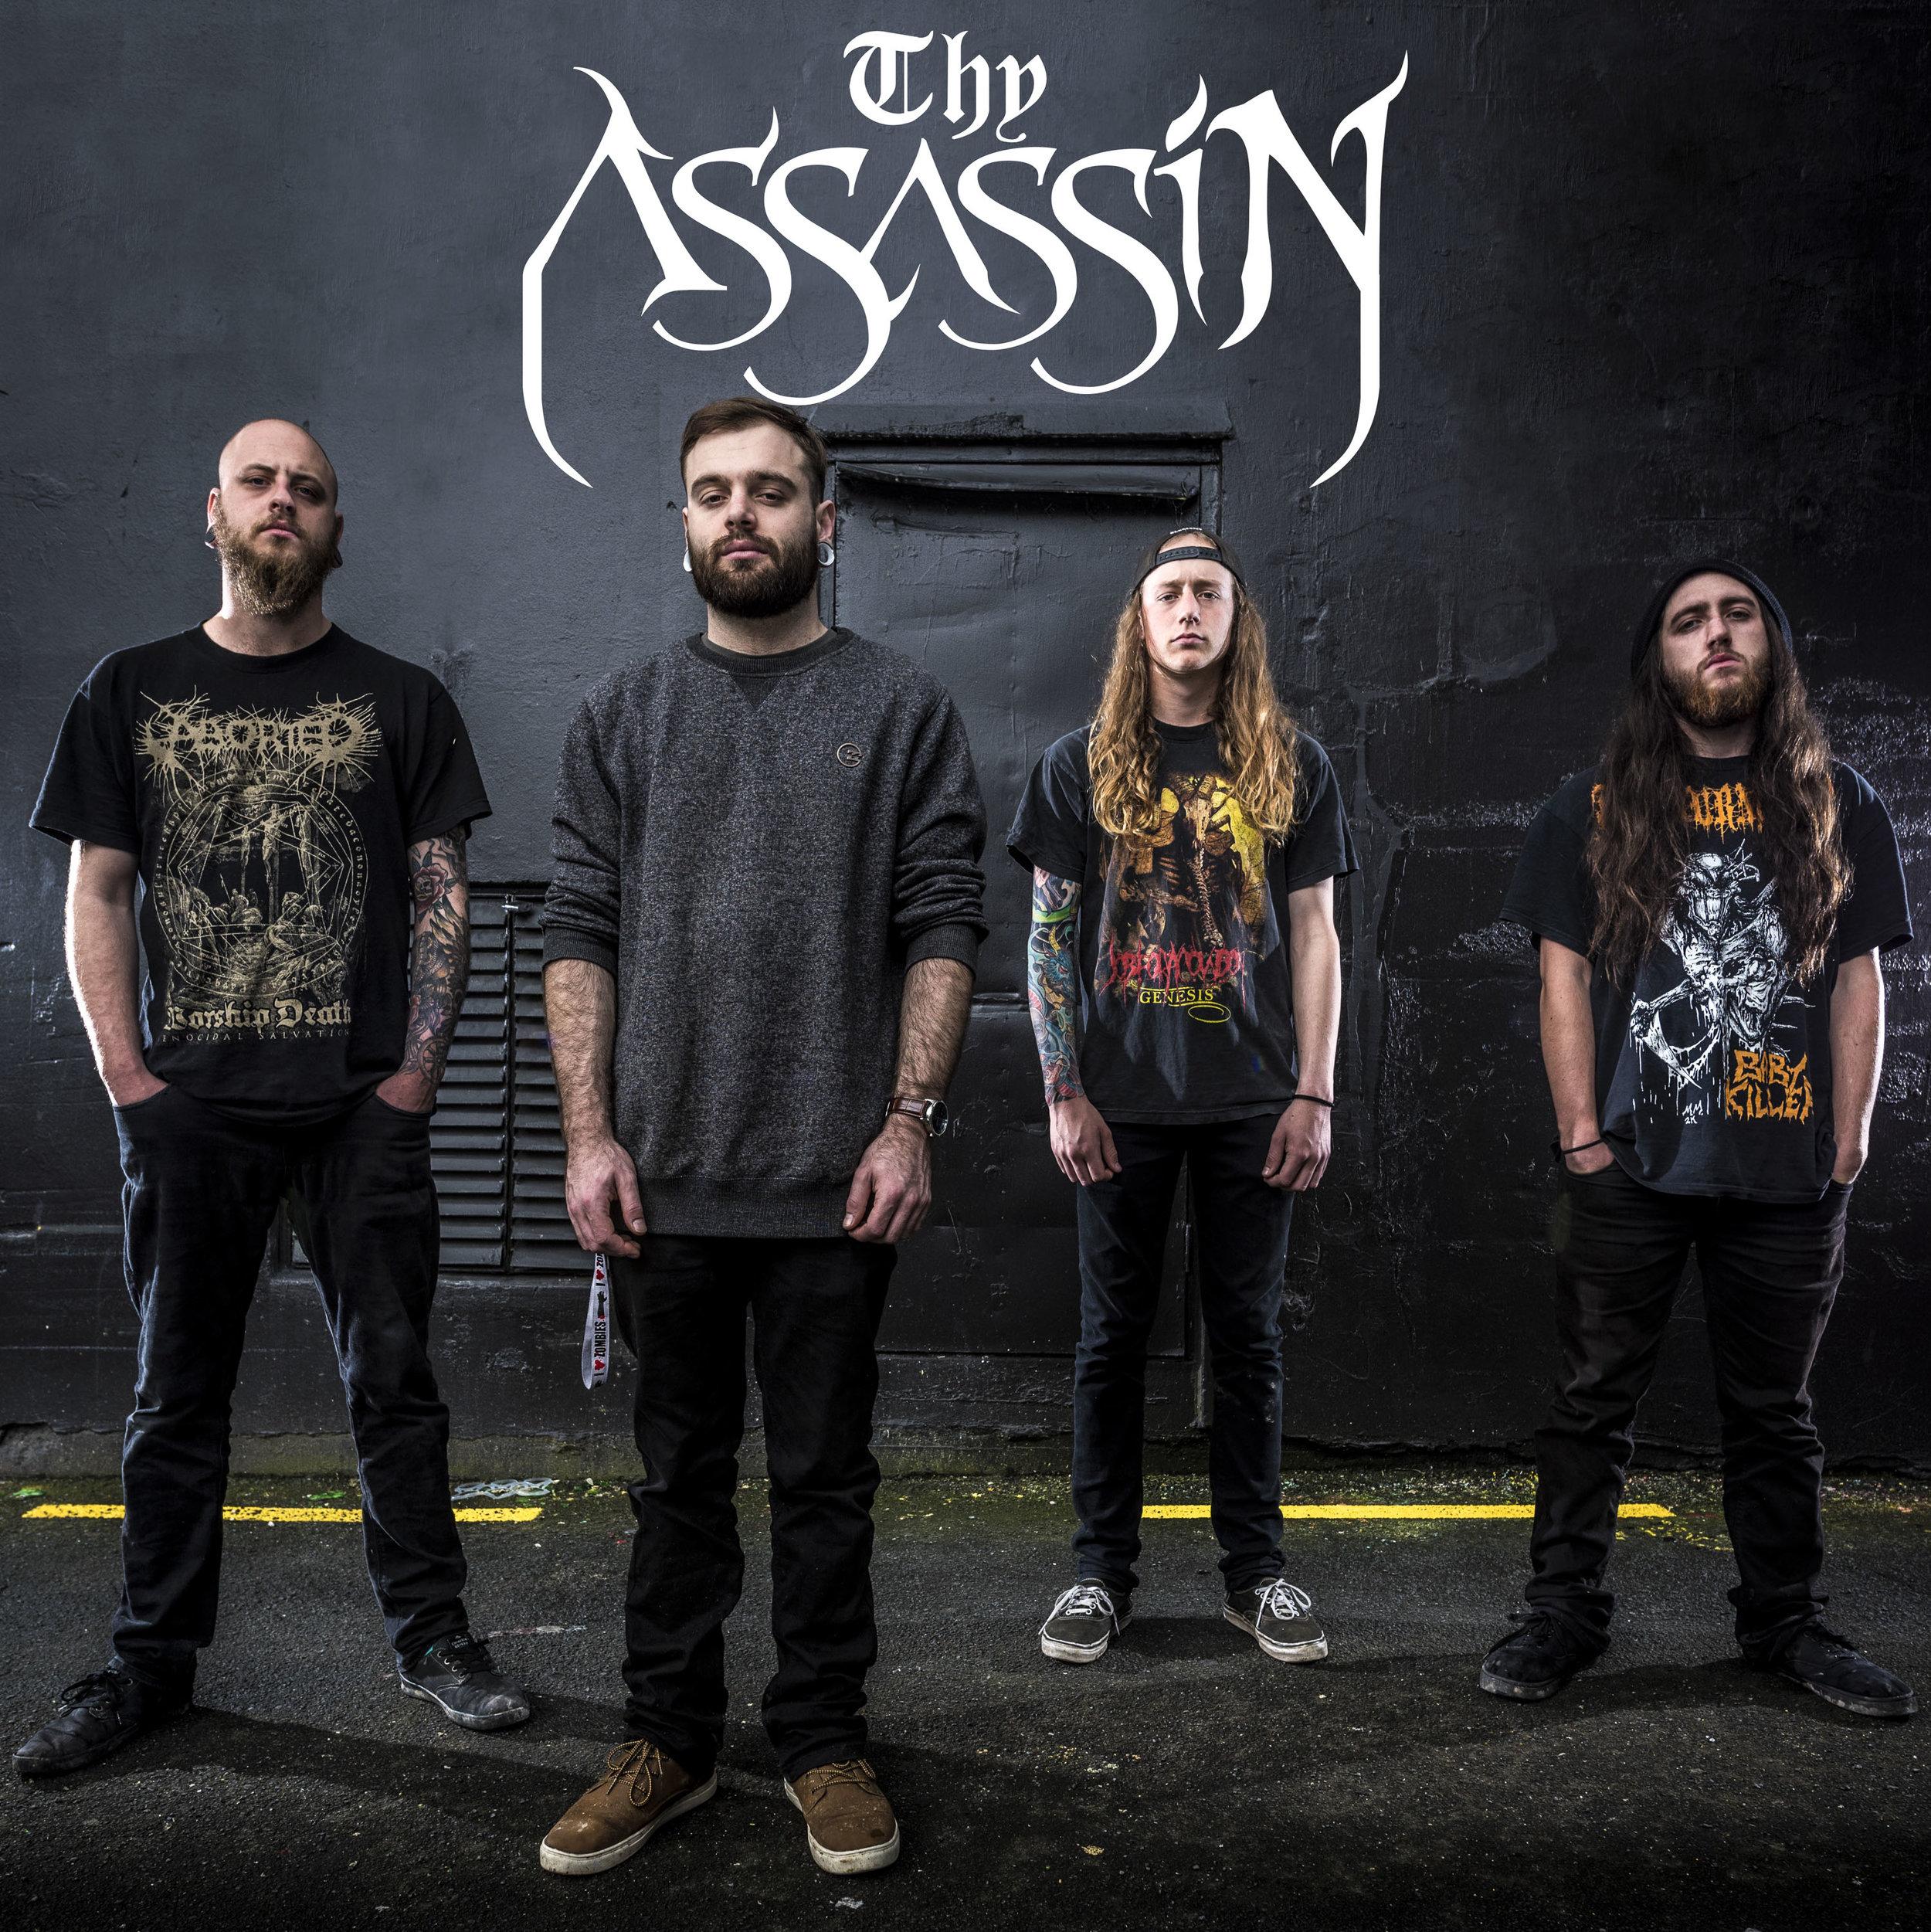 Thy Assassin